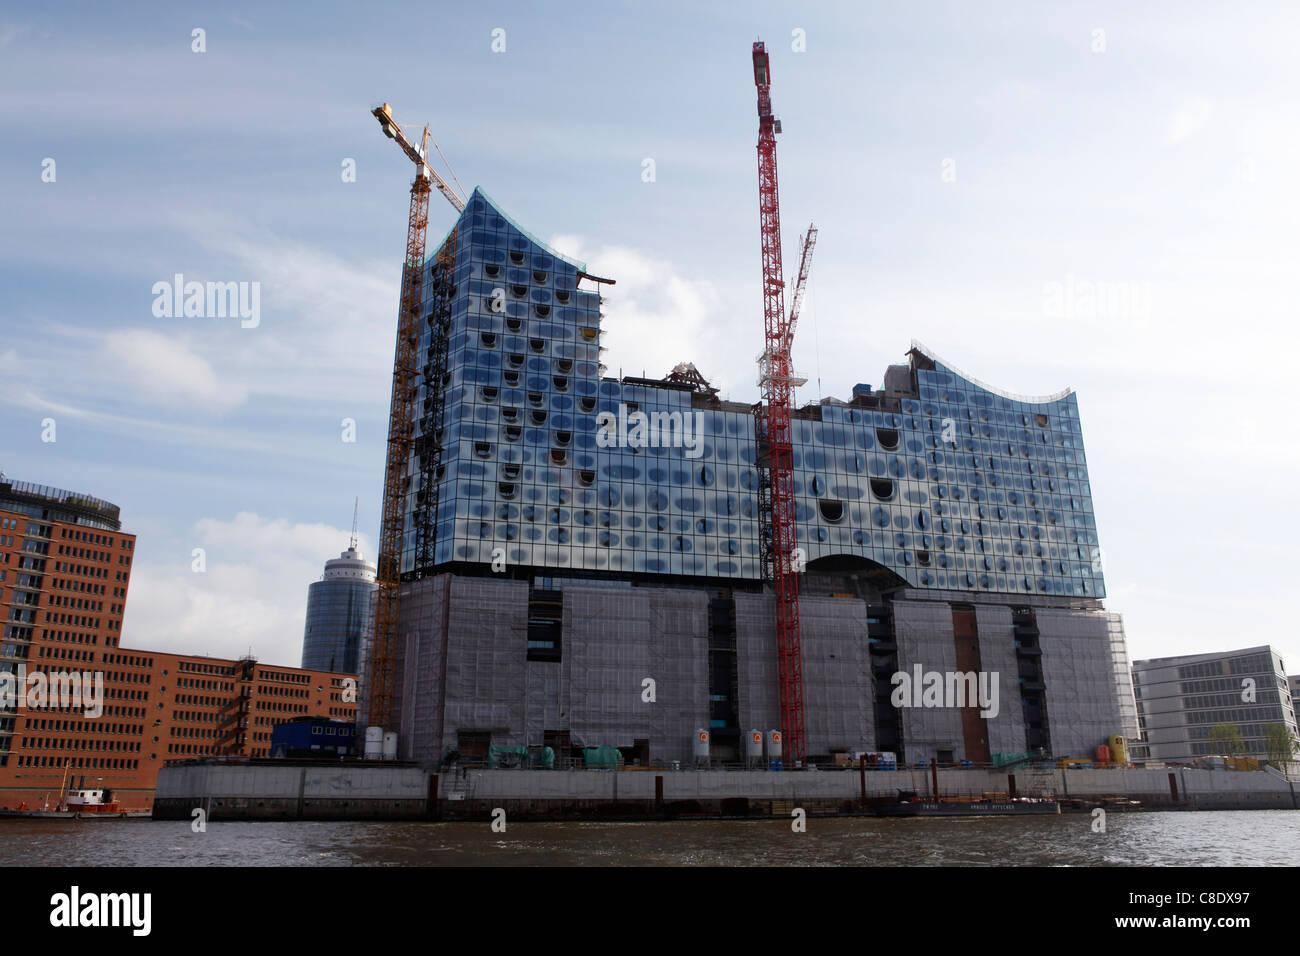 Construction of the Elbphilharmonie in the HafenCity, Hamburg, Germany. - Stock Image